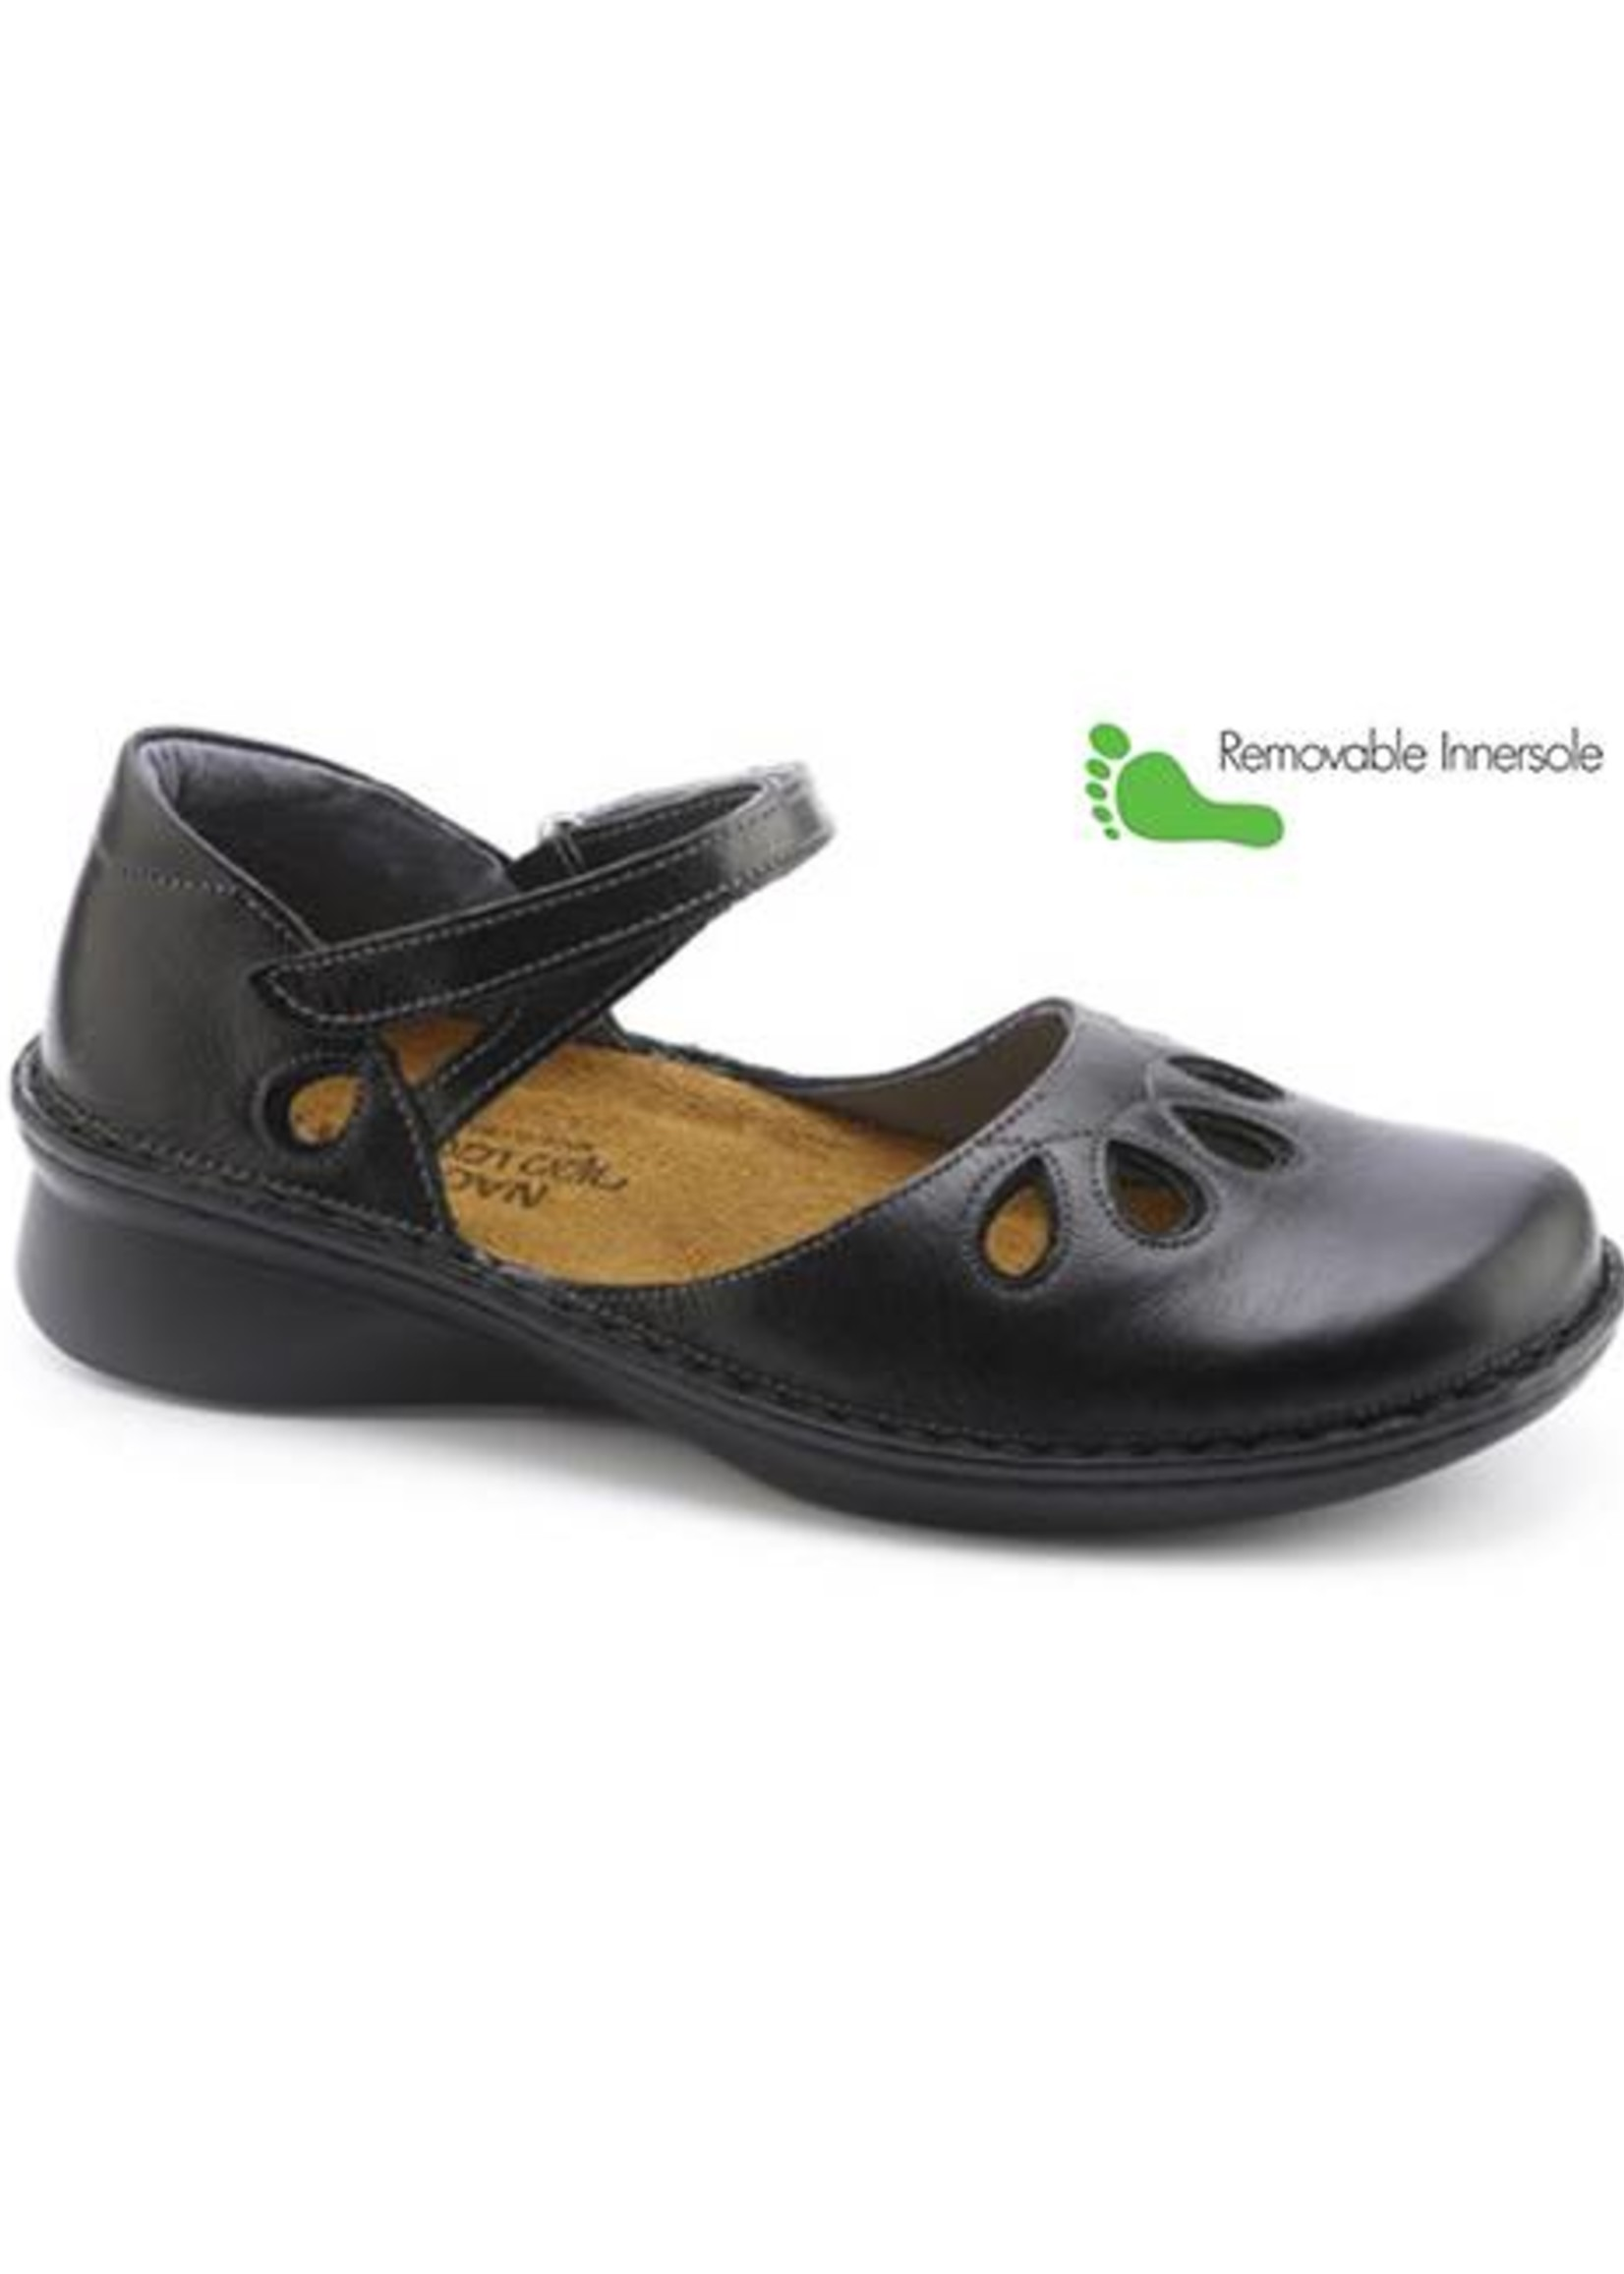 Naot Footwear Motif in Black Madras